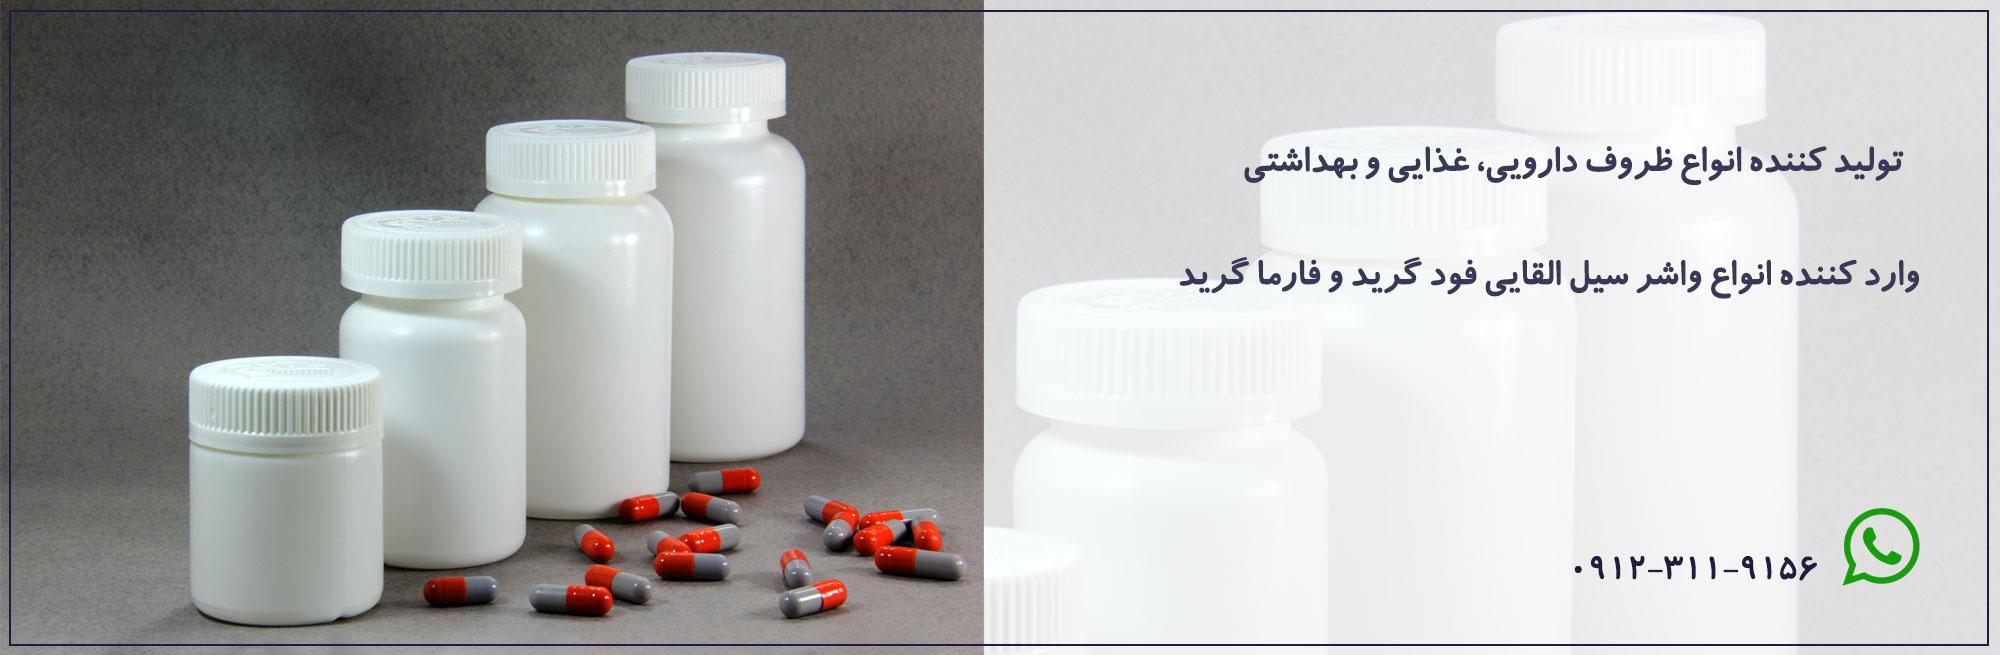 ظروف پلاستیکی داروییو غذایی